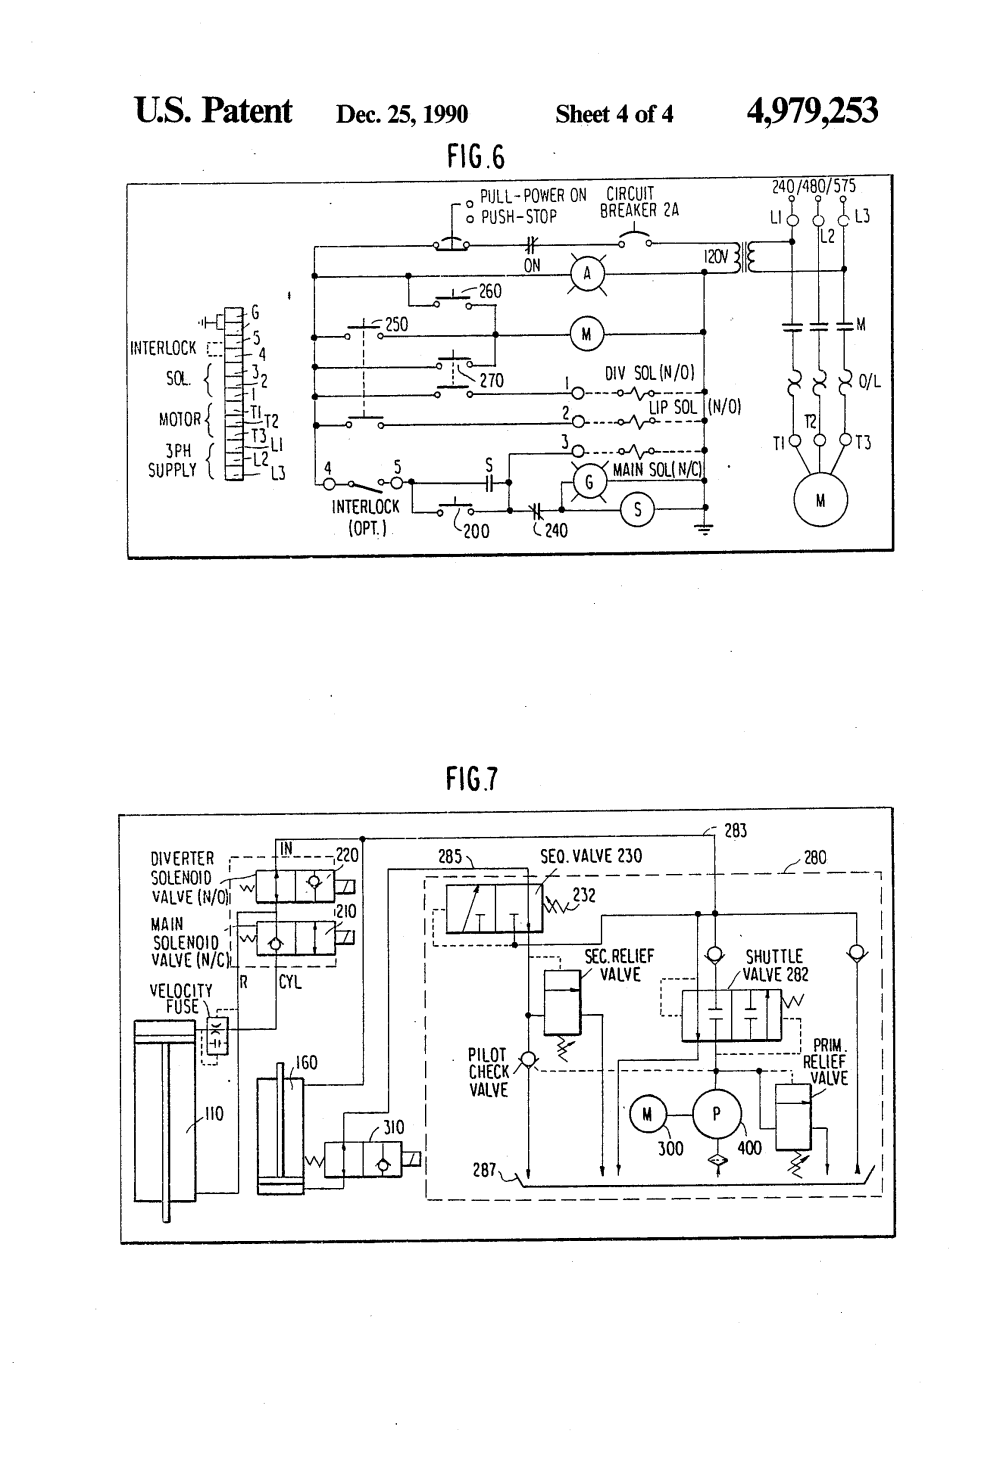 medium resolution of dock wiring diagram wiring diagram name dock v 20 schematic